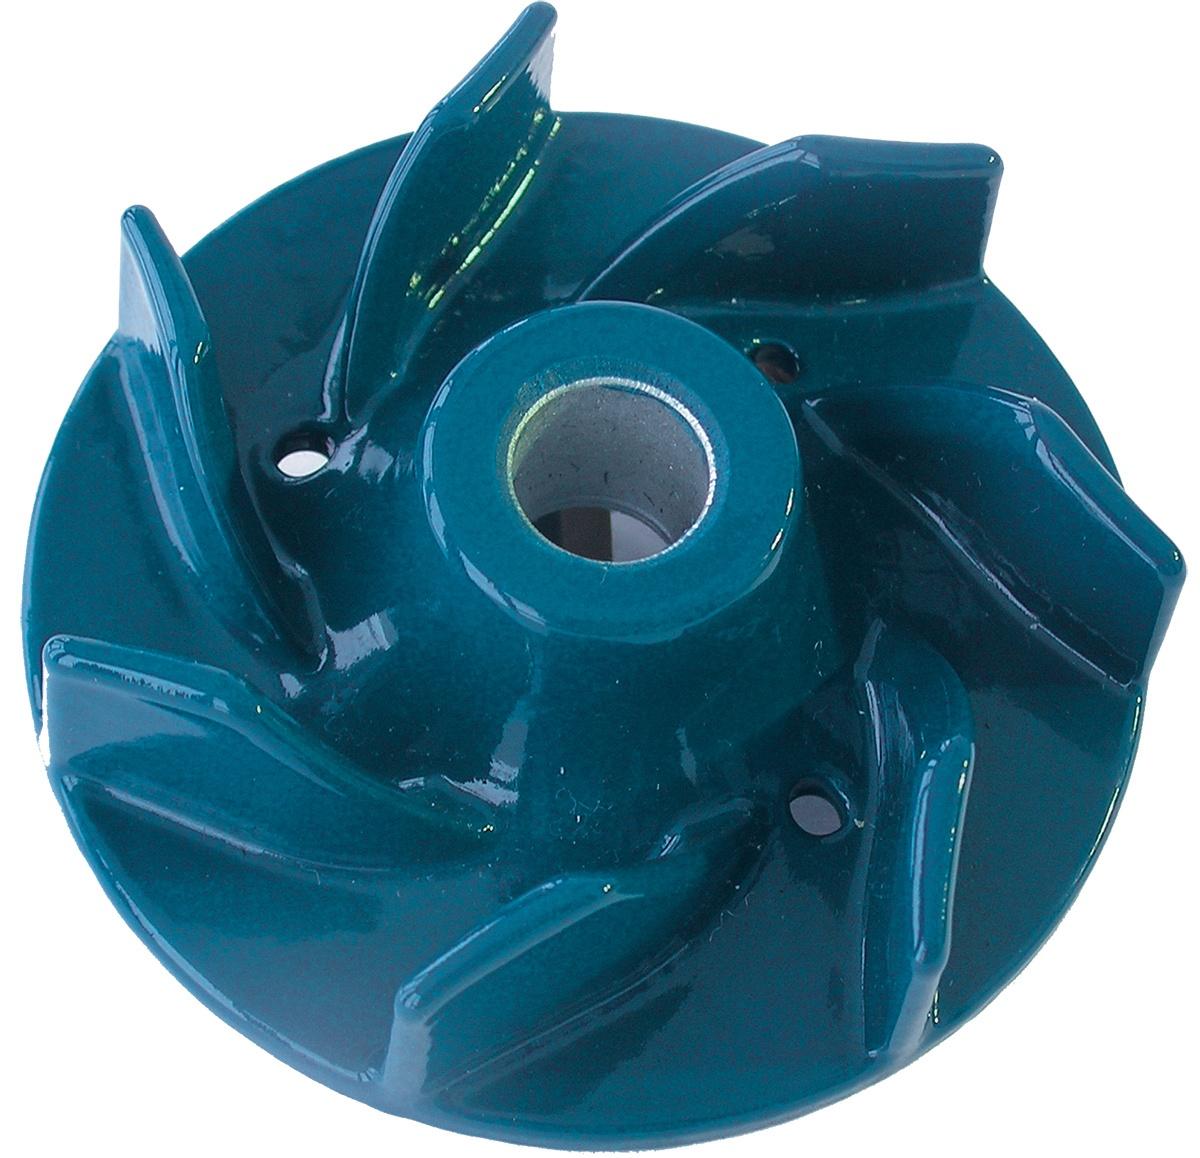 500-Pump_impeller_coating blue.jpg